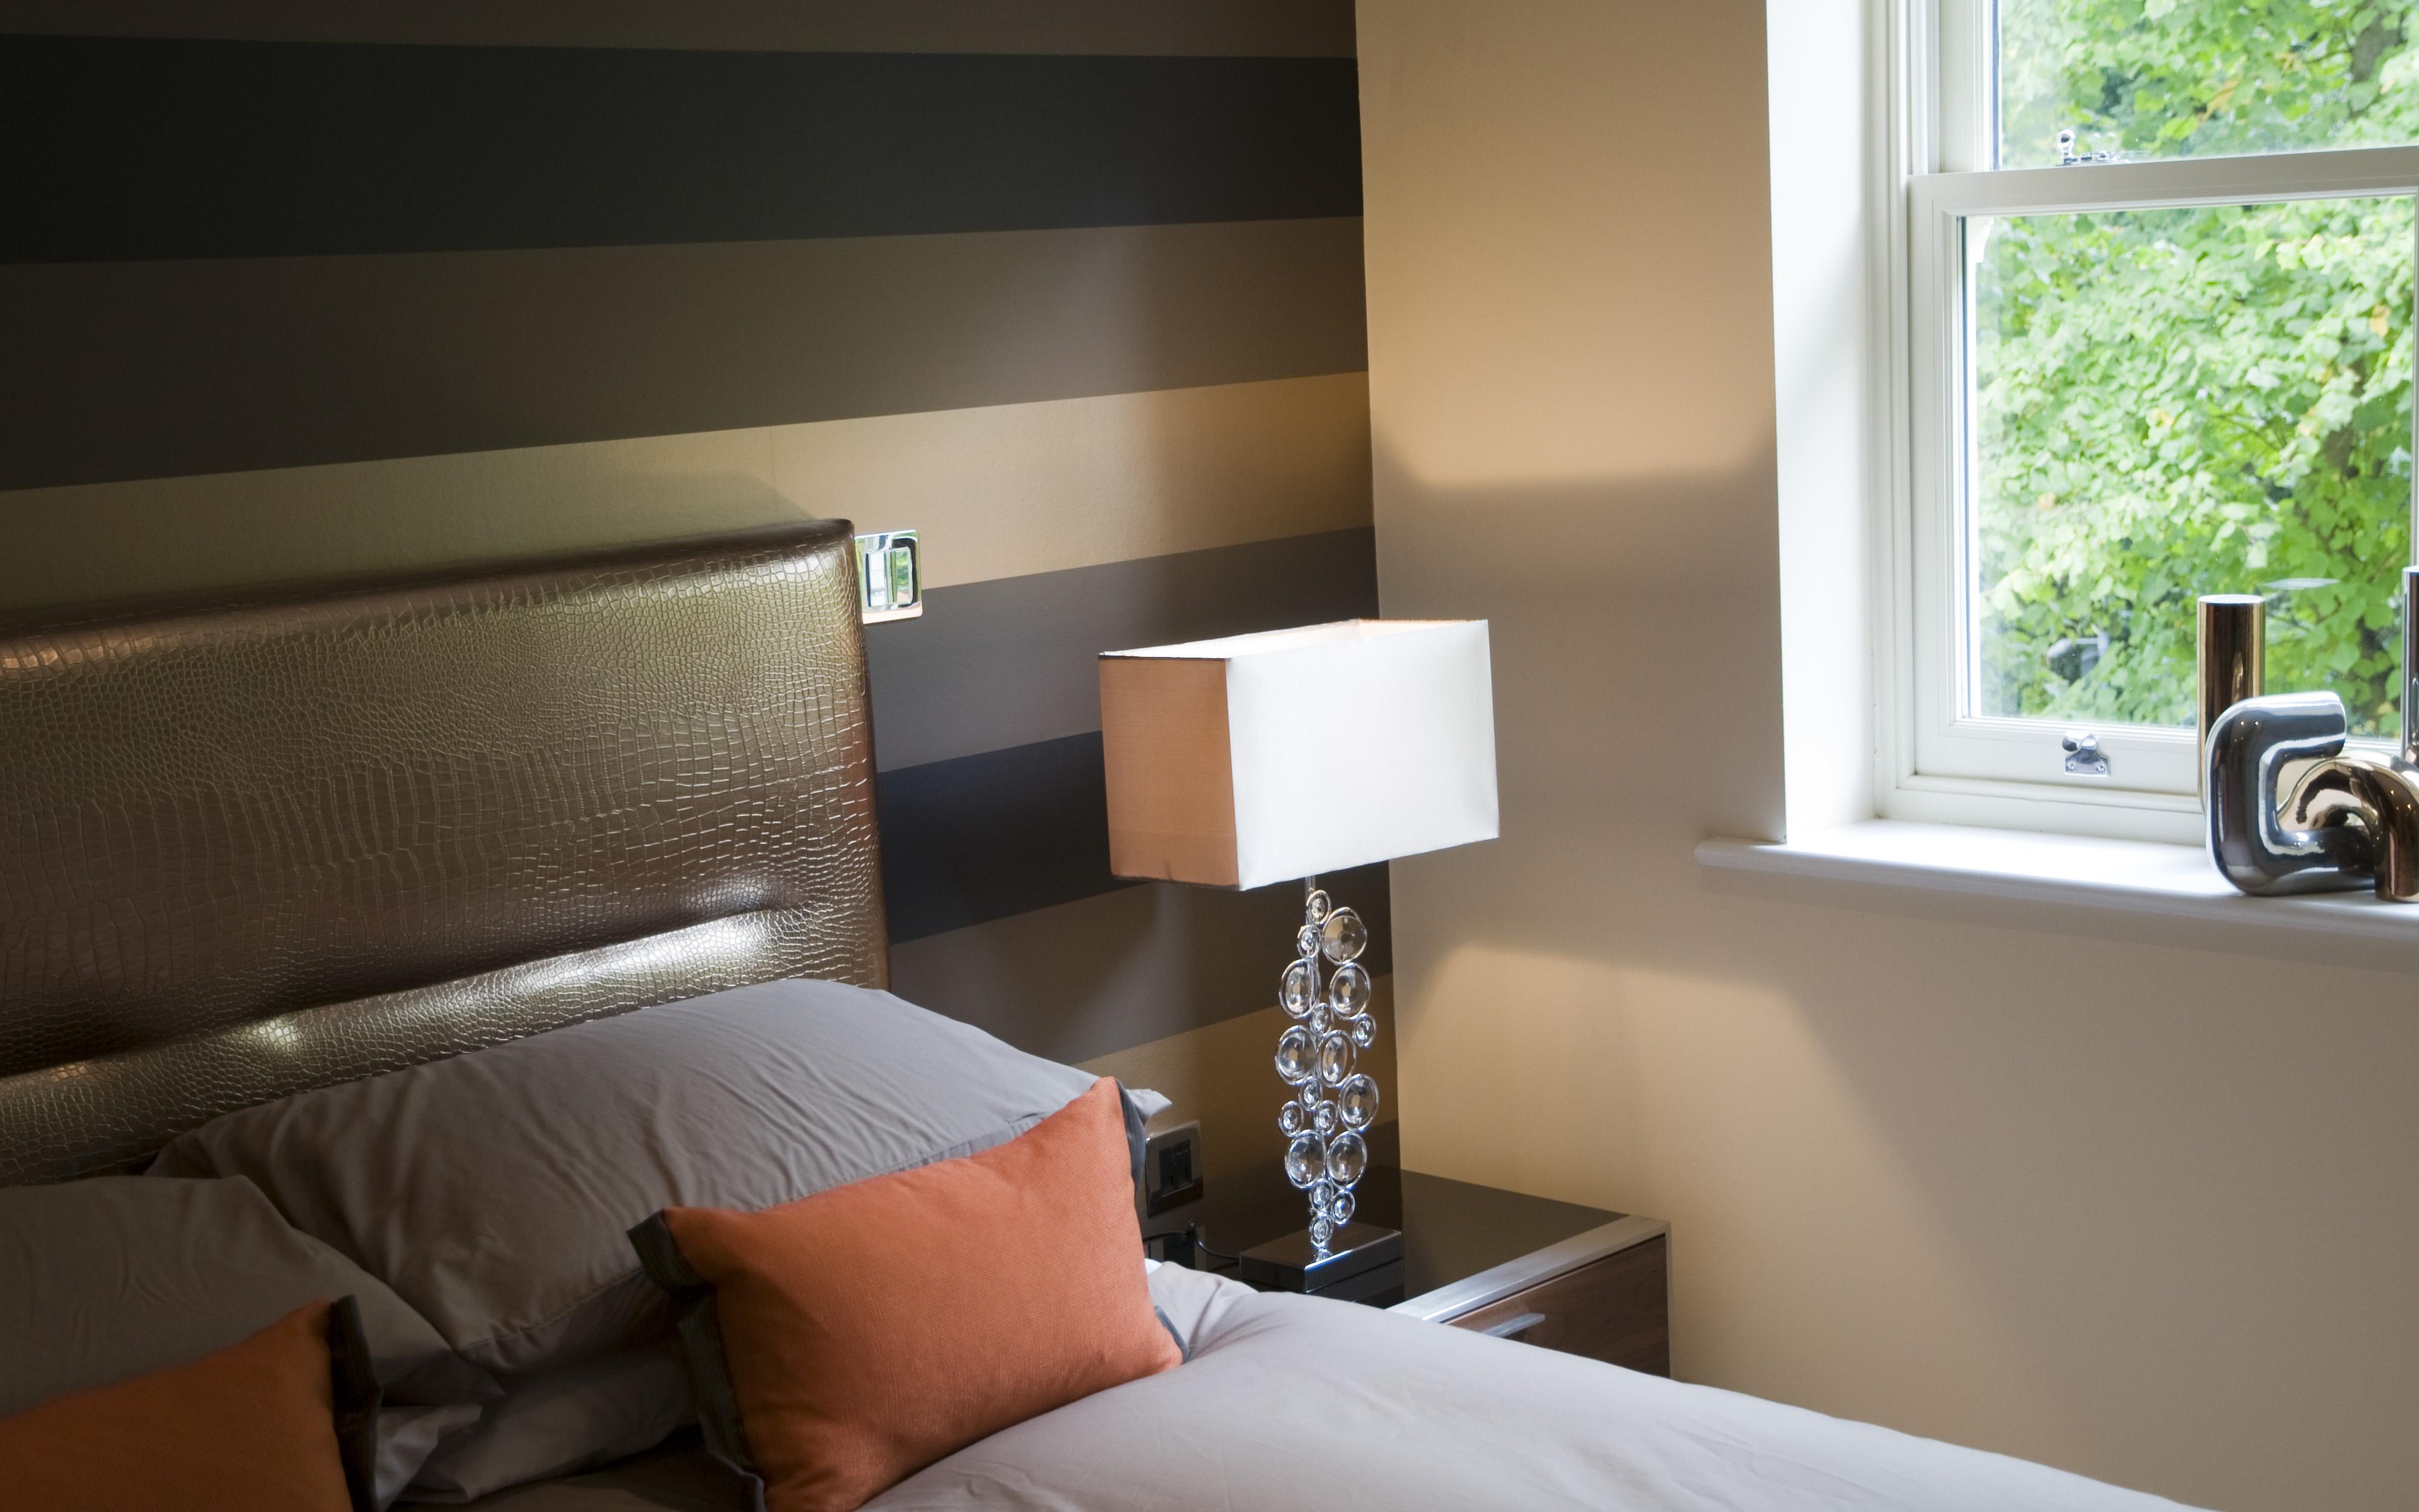 Horizontal striped wallpaper sits behind a bespoke fauz croc skin 3998x2499